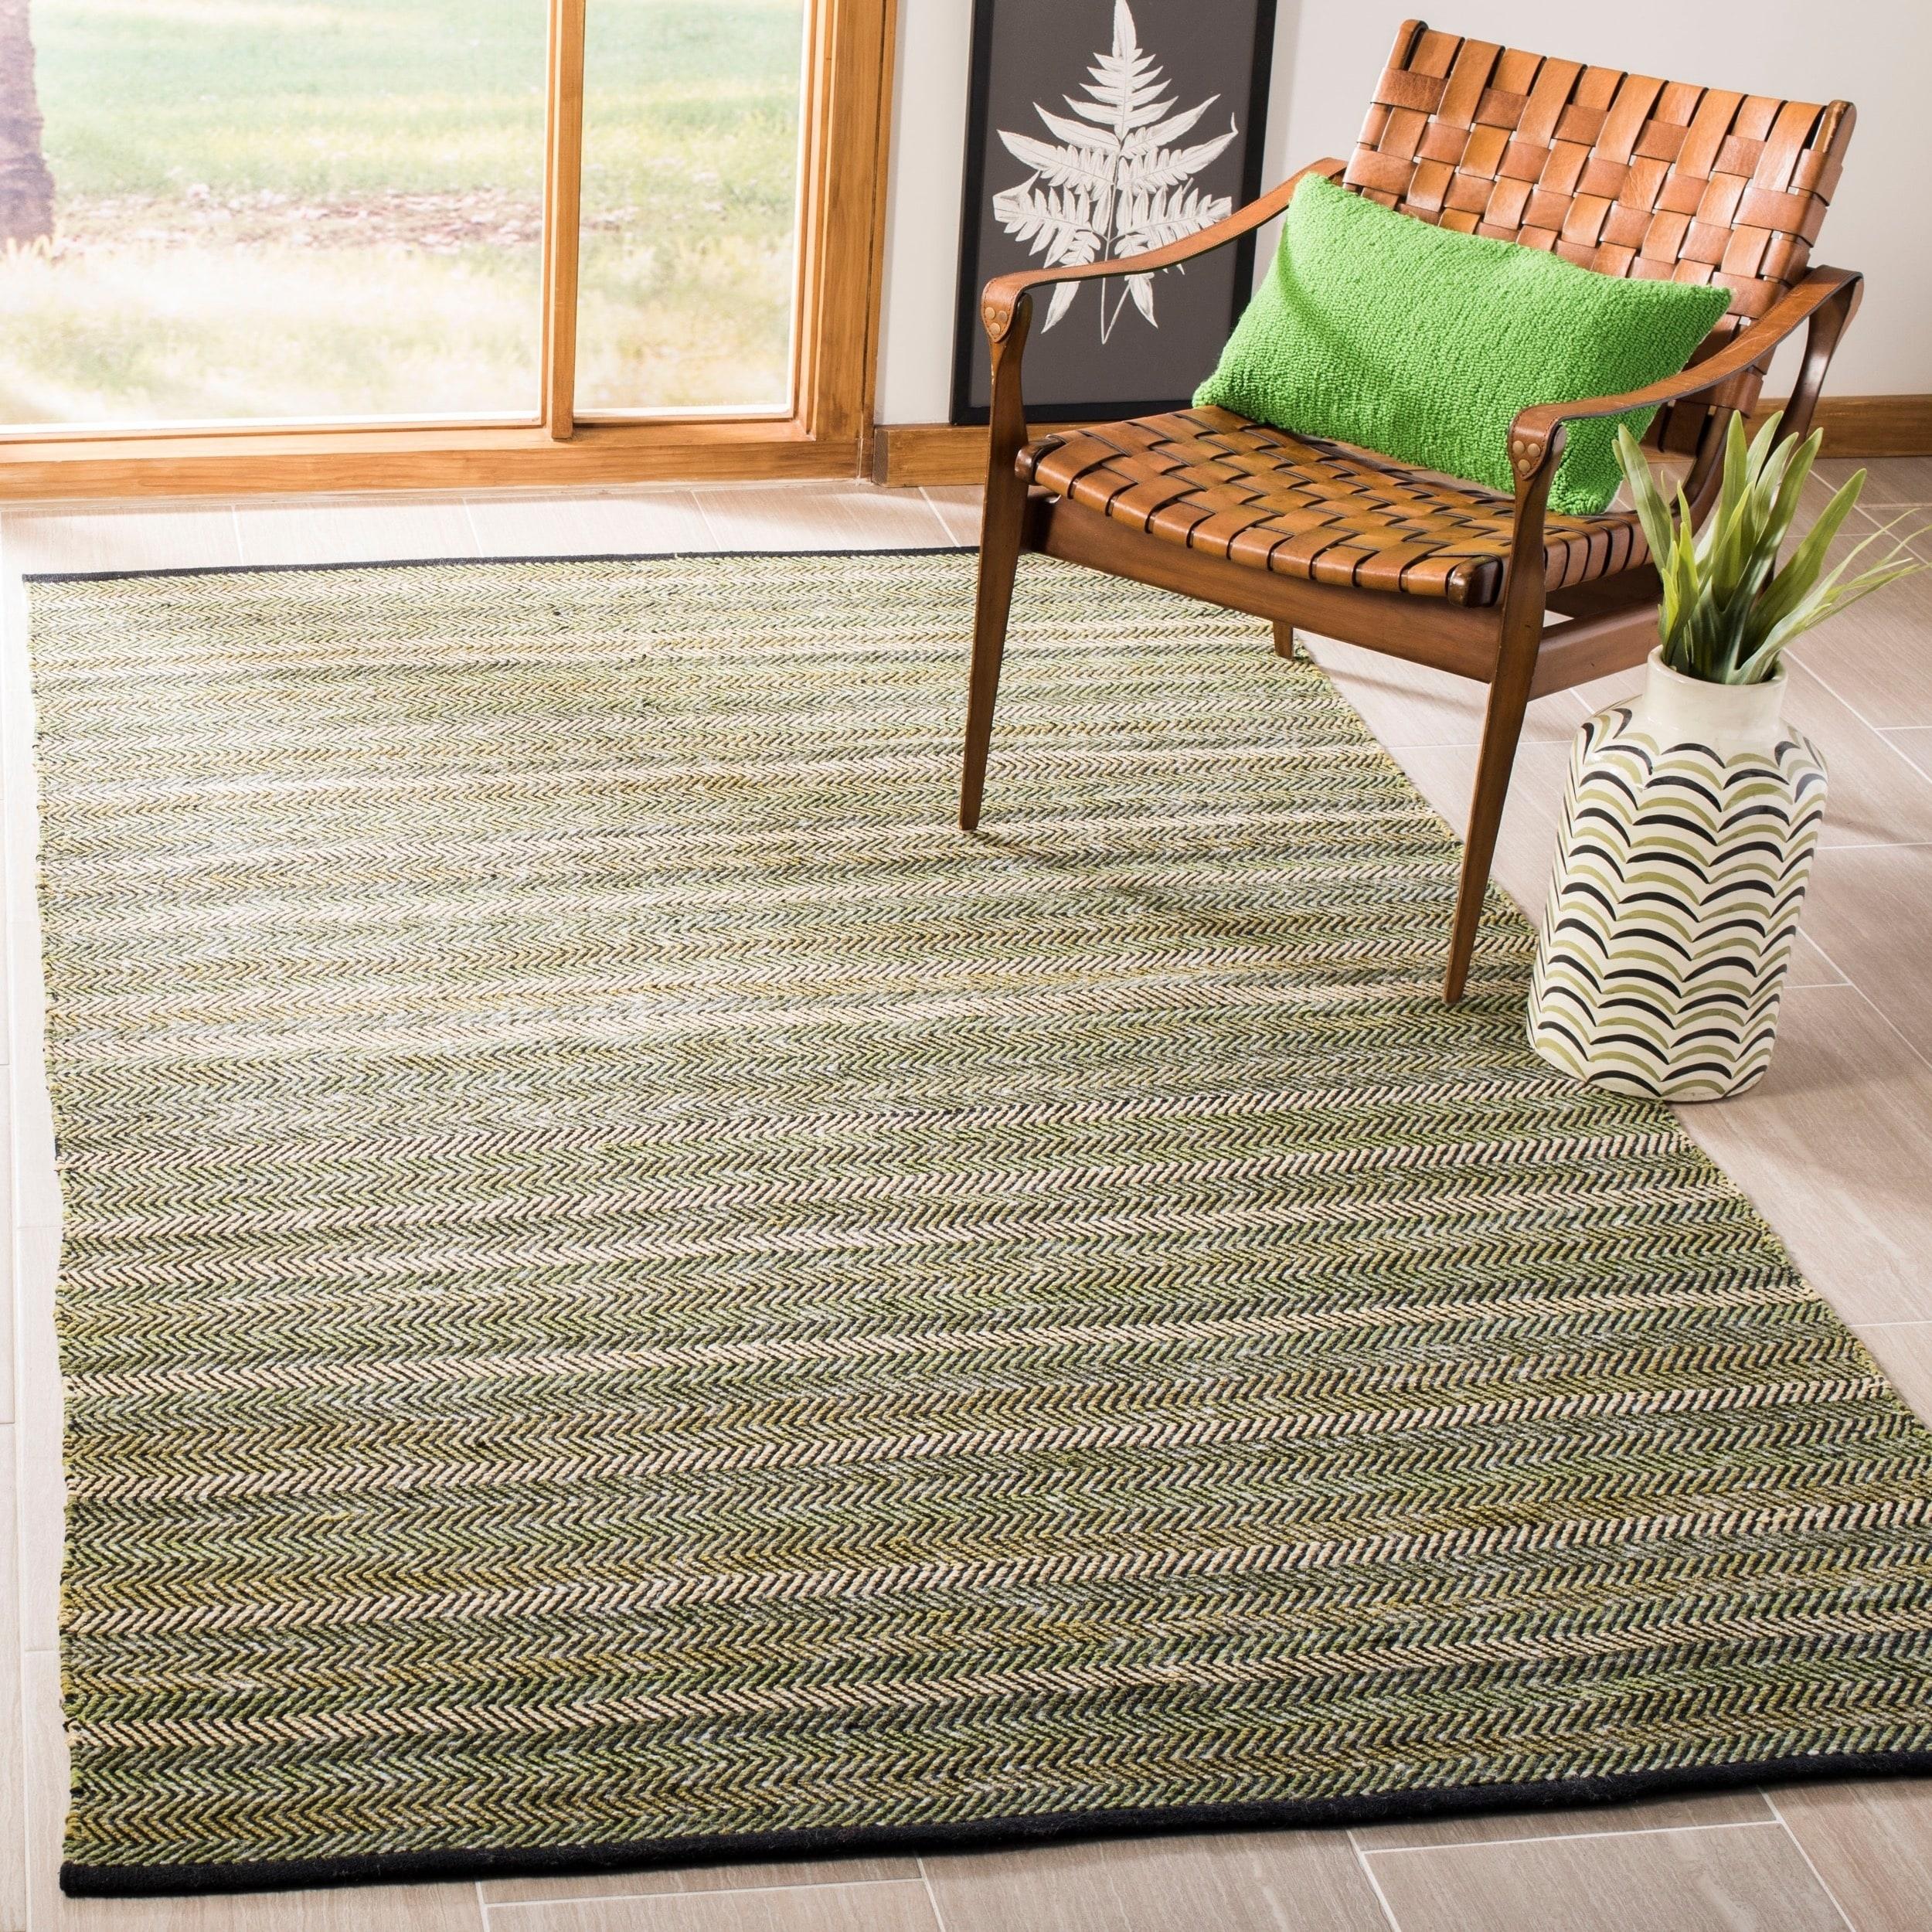 Safavieh Handmade Striped Kilim Clorinda Stripe Wool Rug